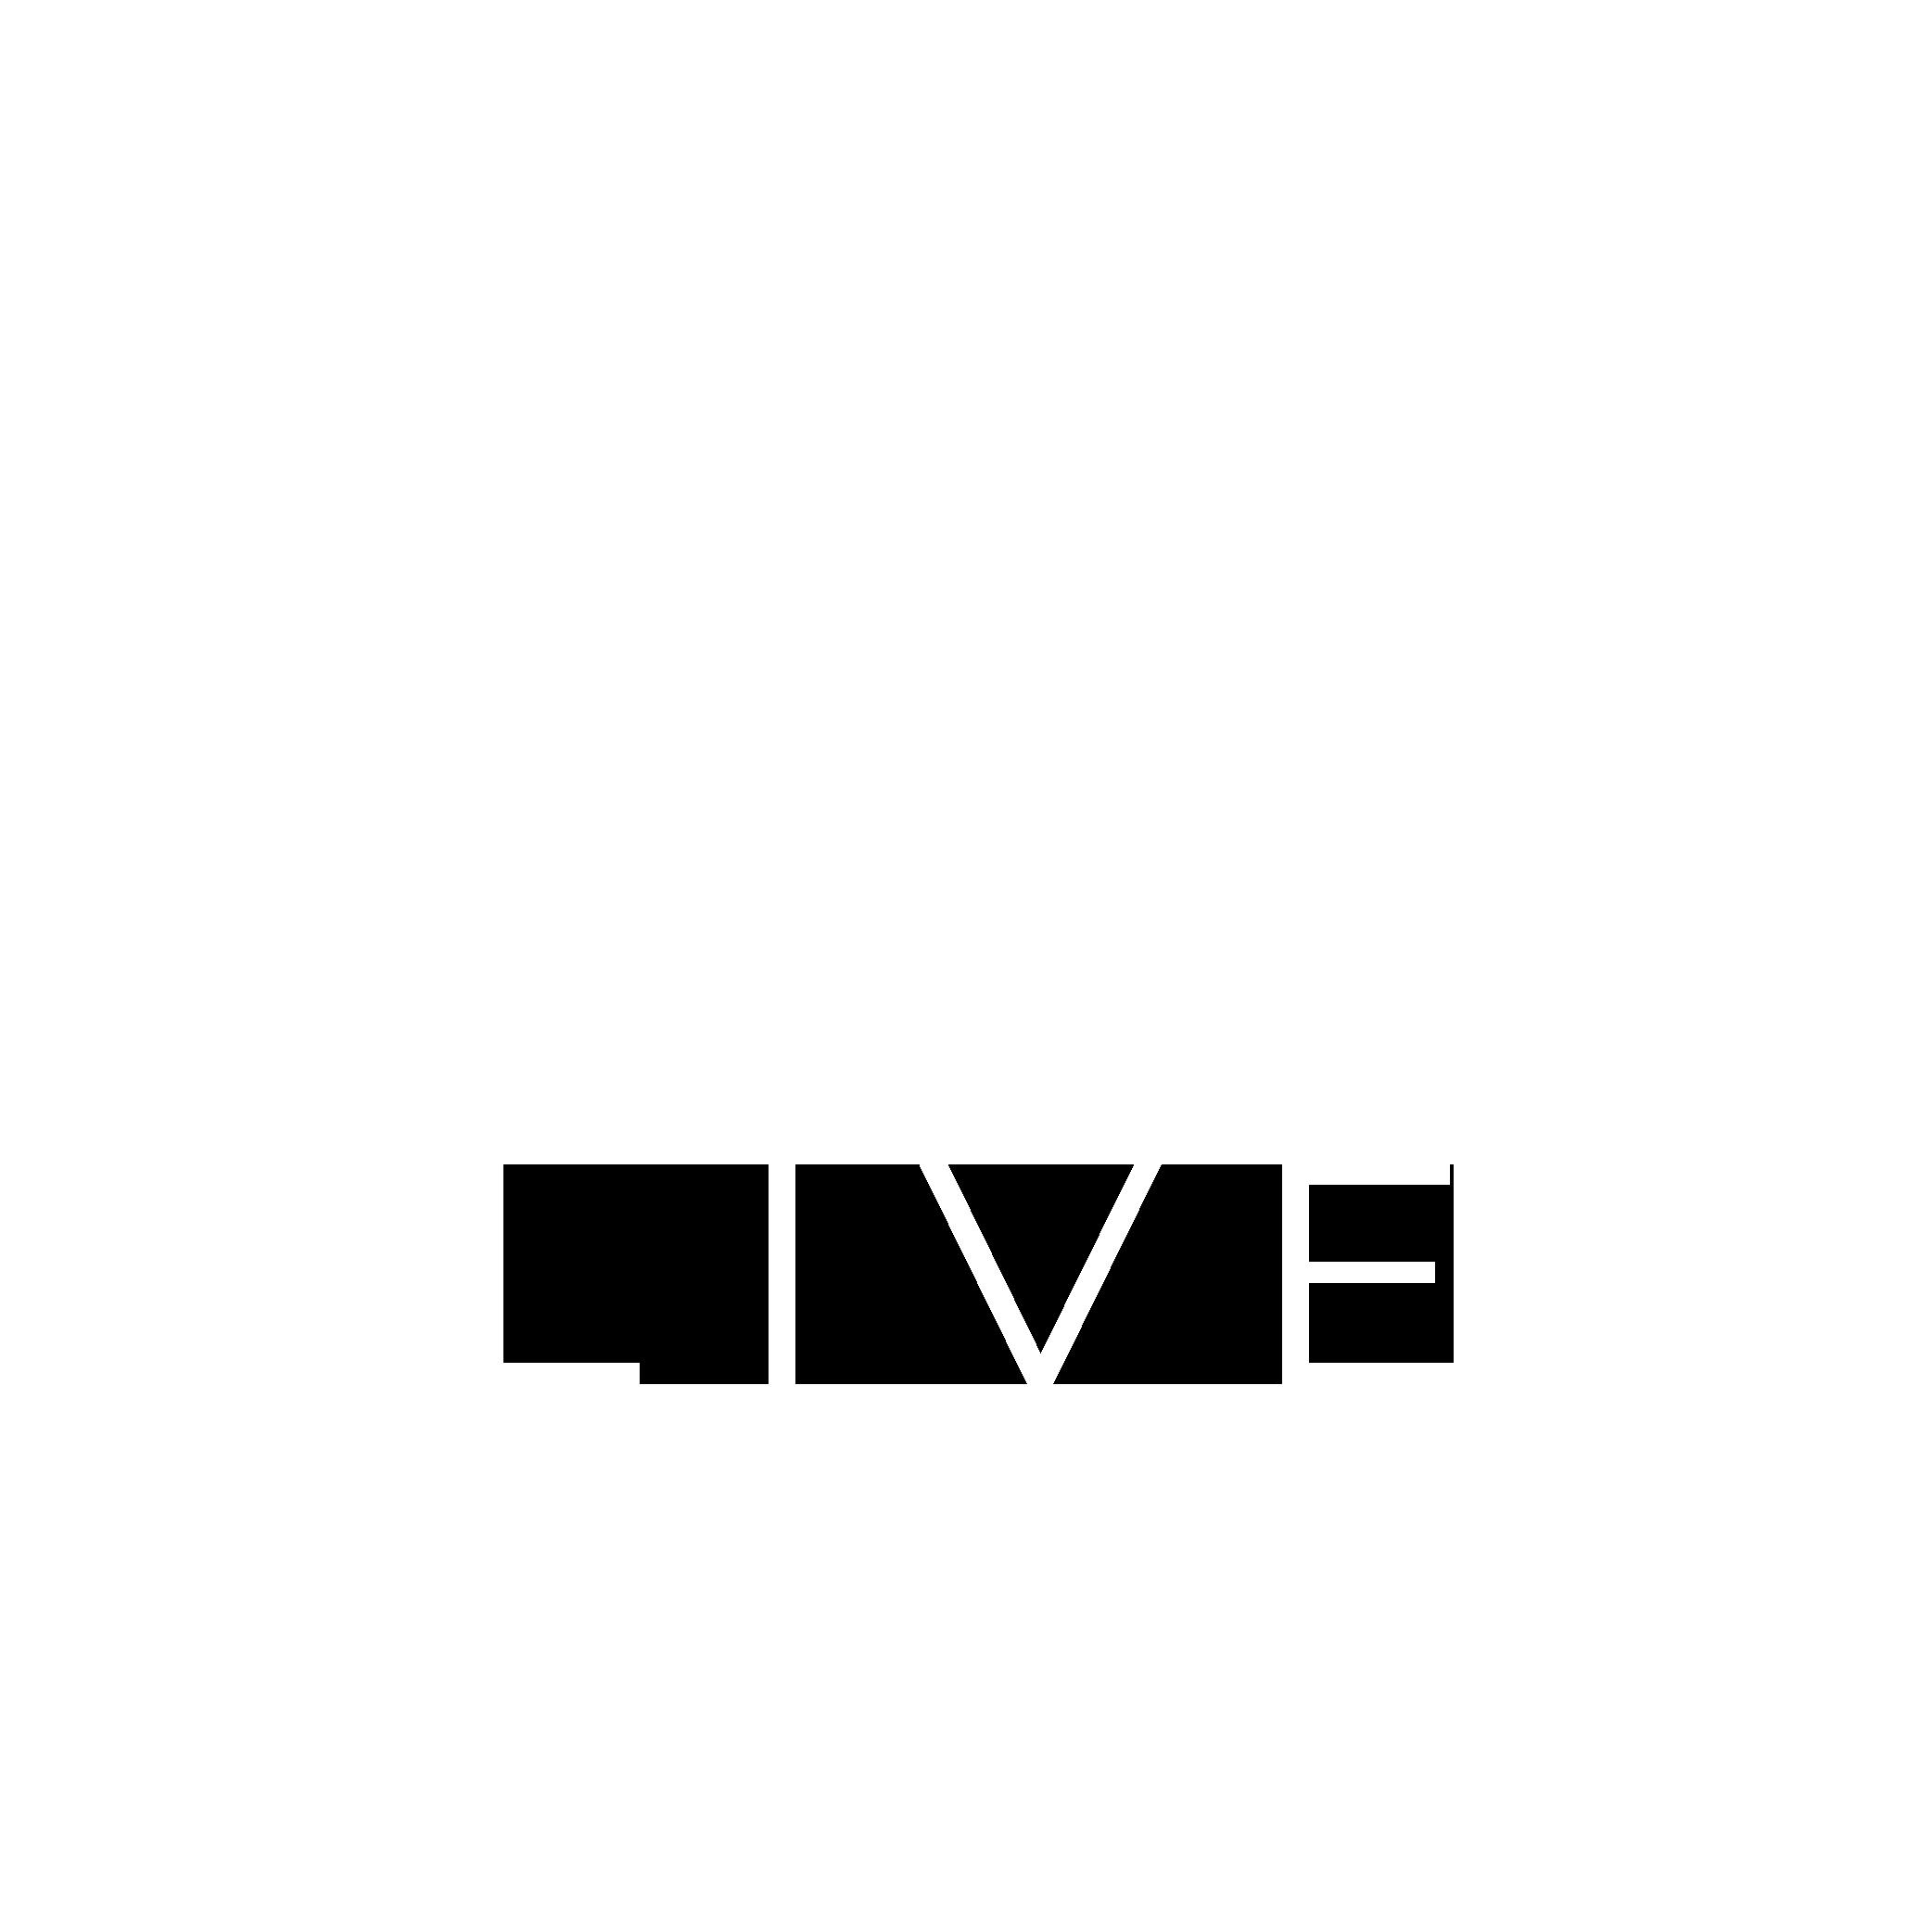 B&W LIVE